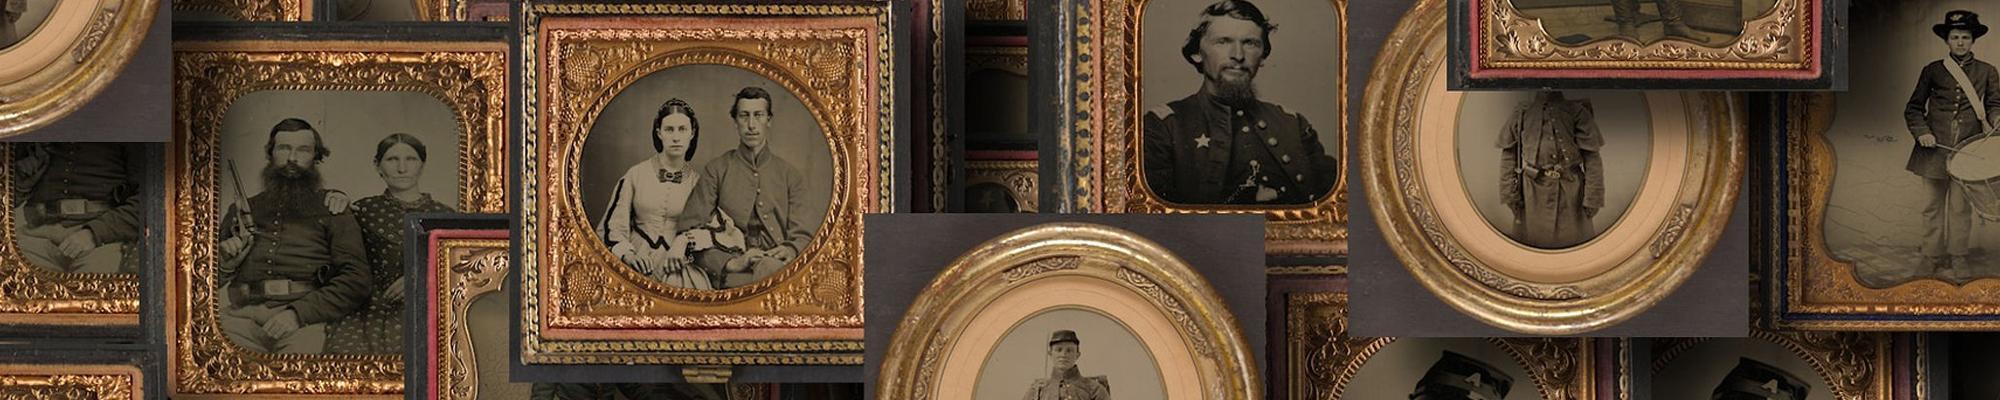 wall of civil war portraits